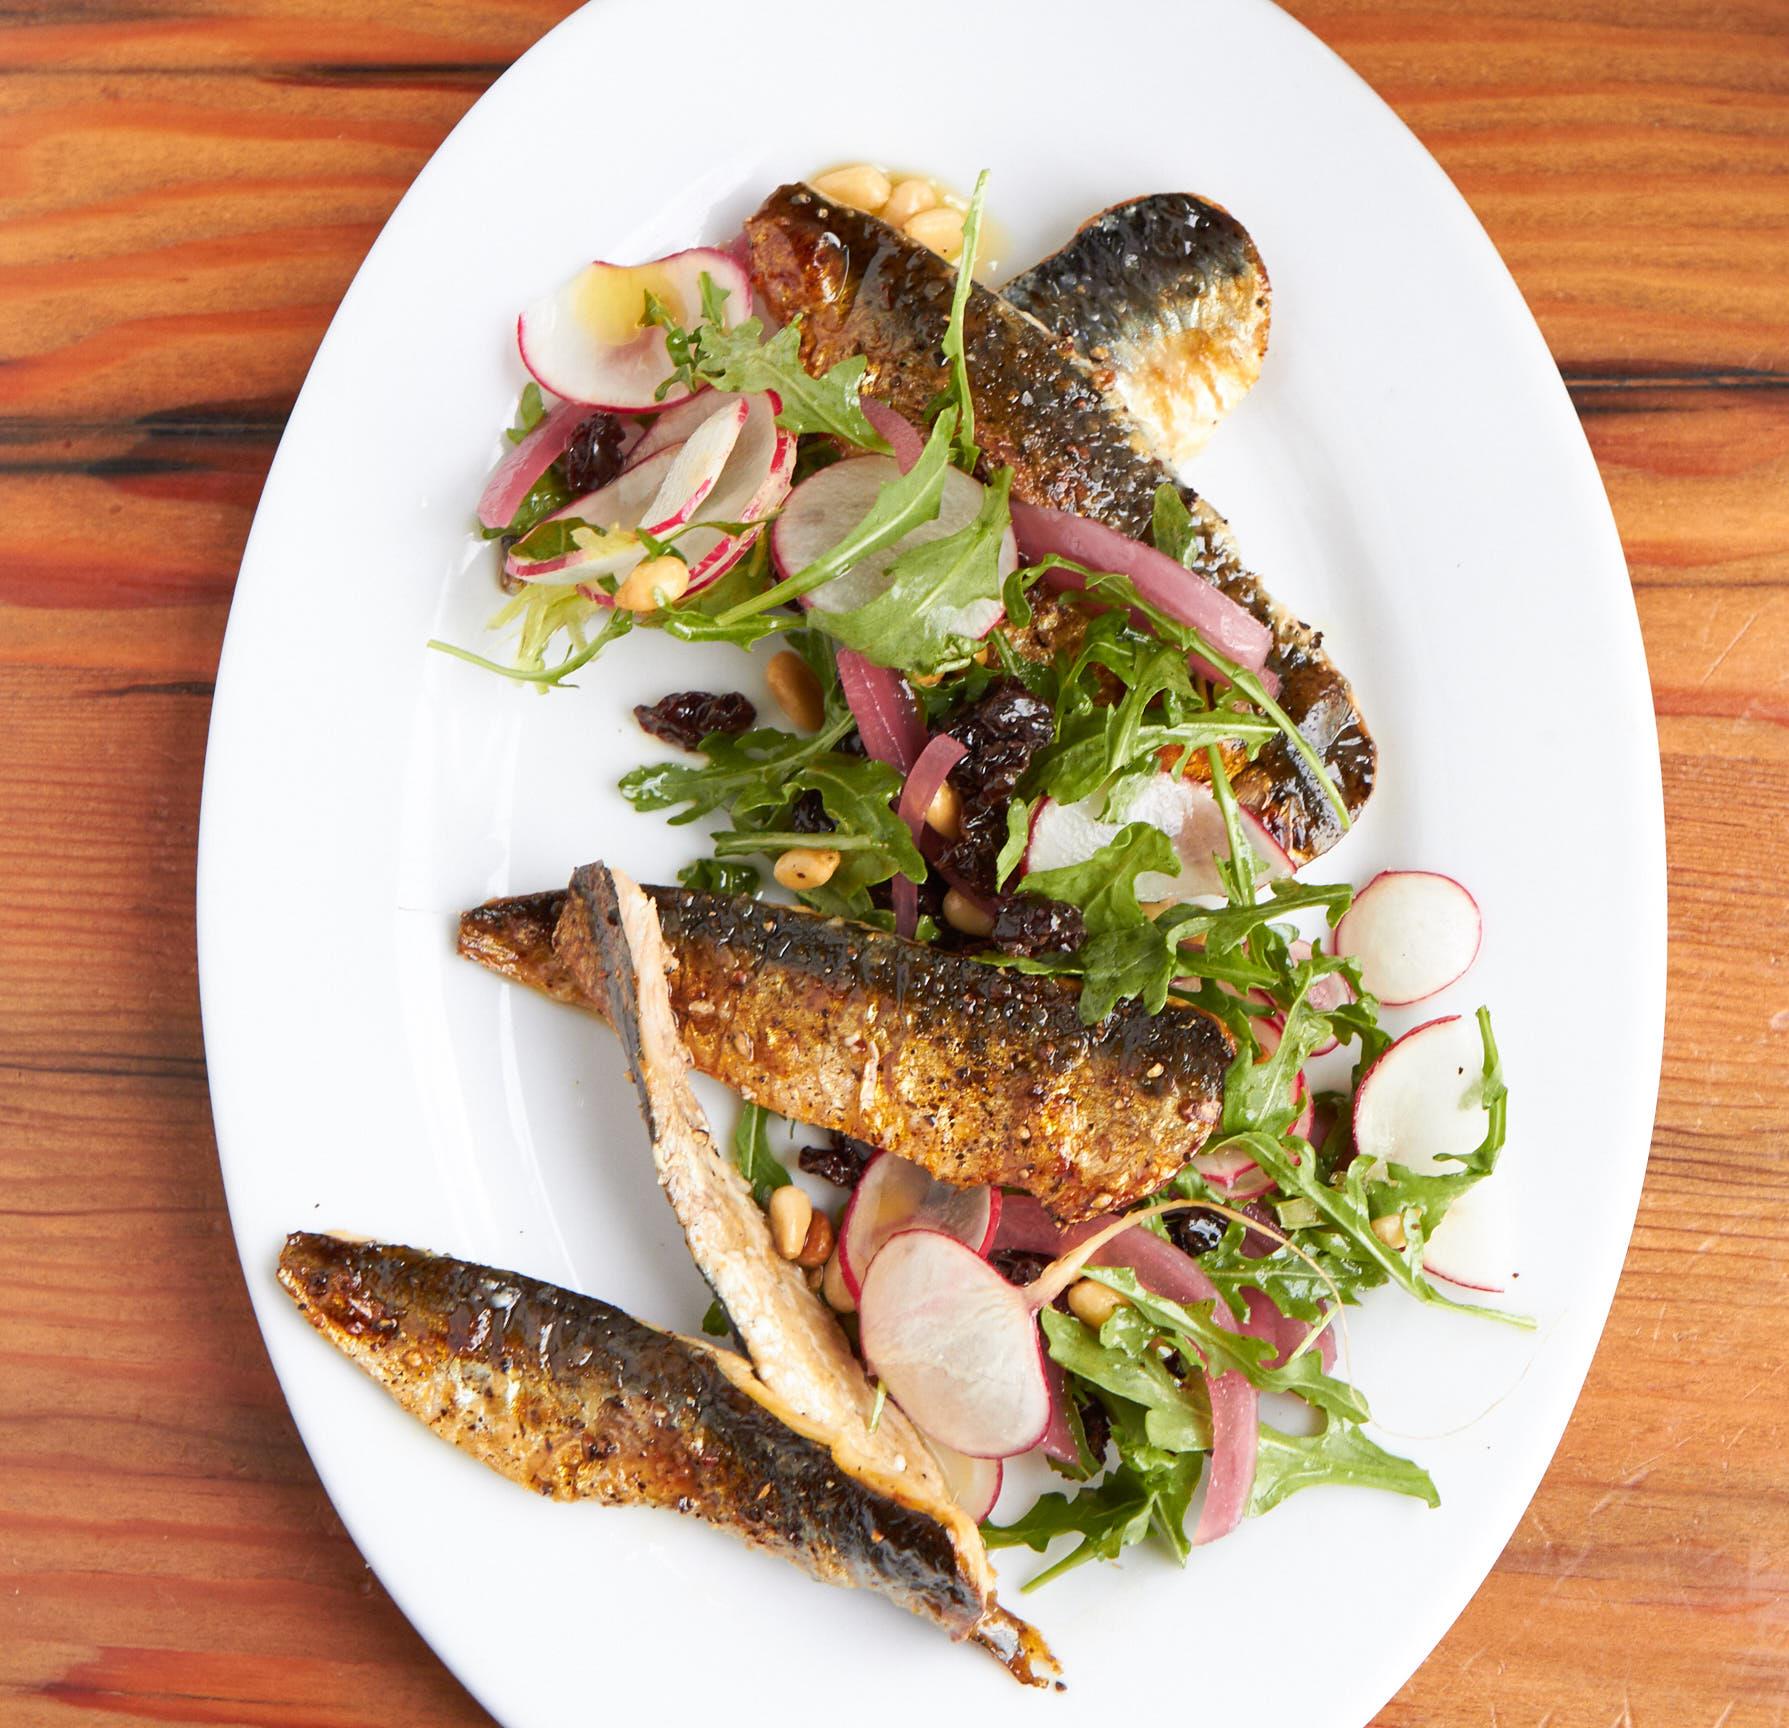 sardines 02.04.19_055.jpg